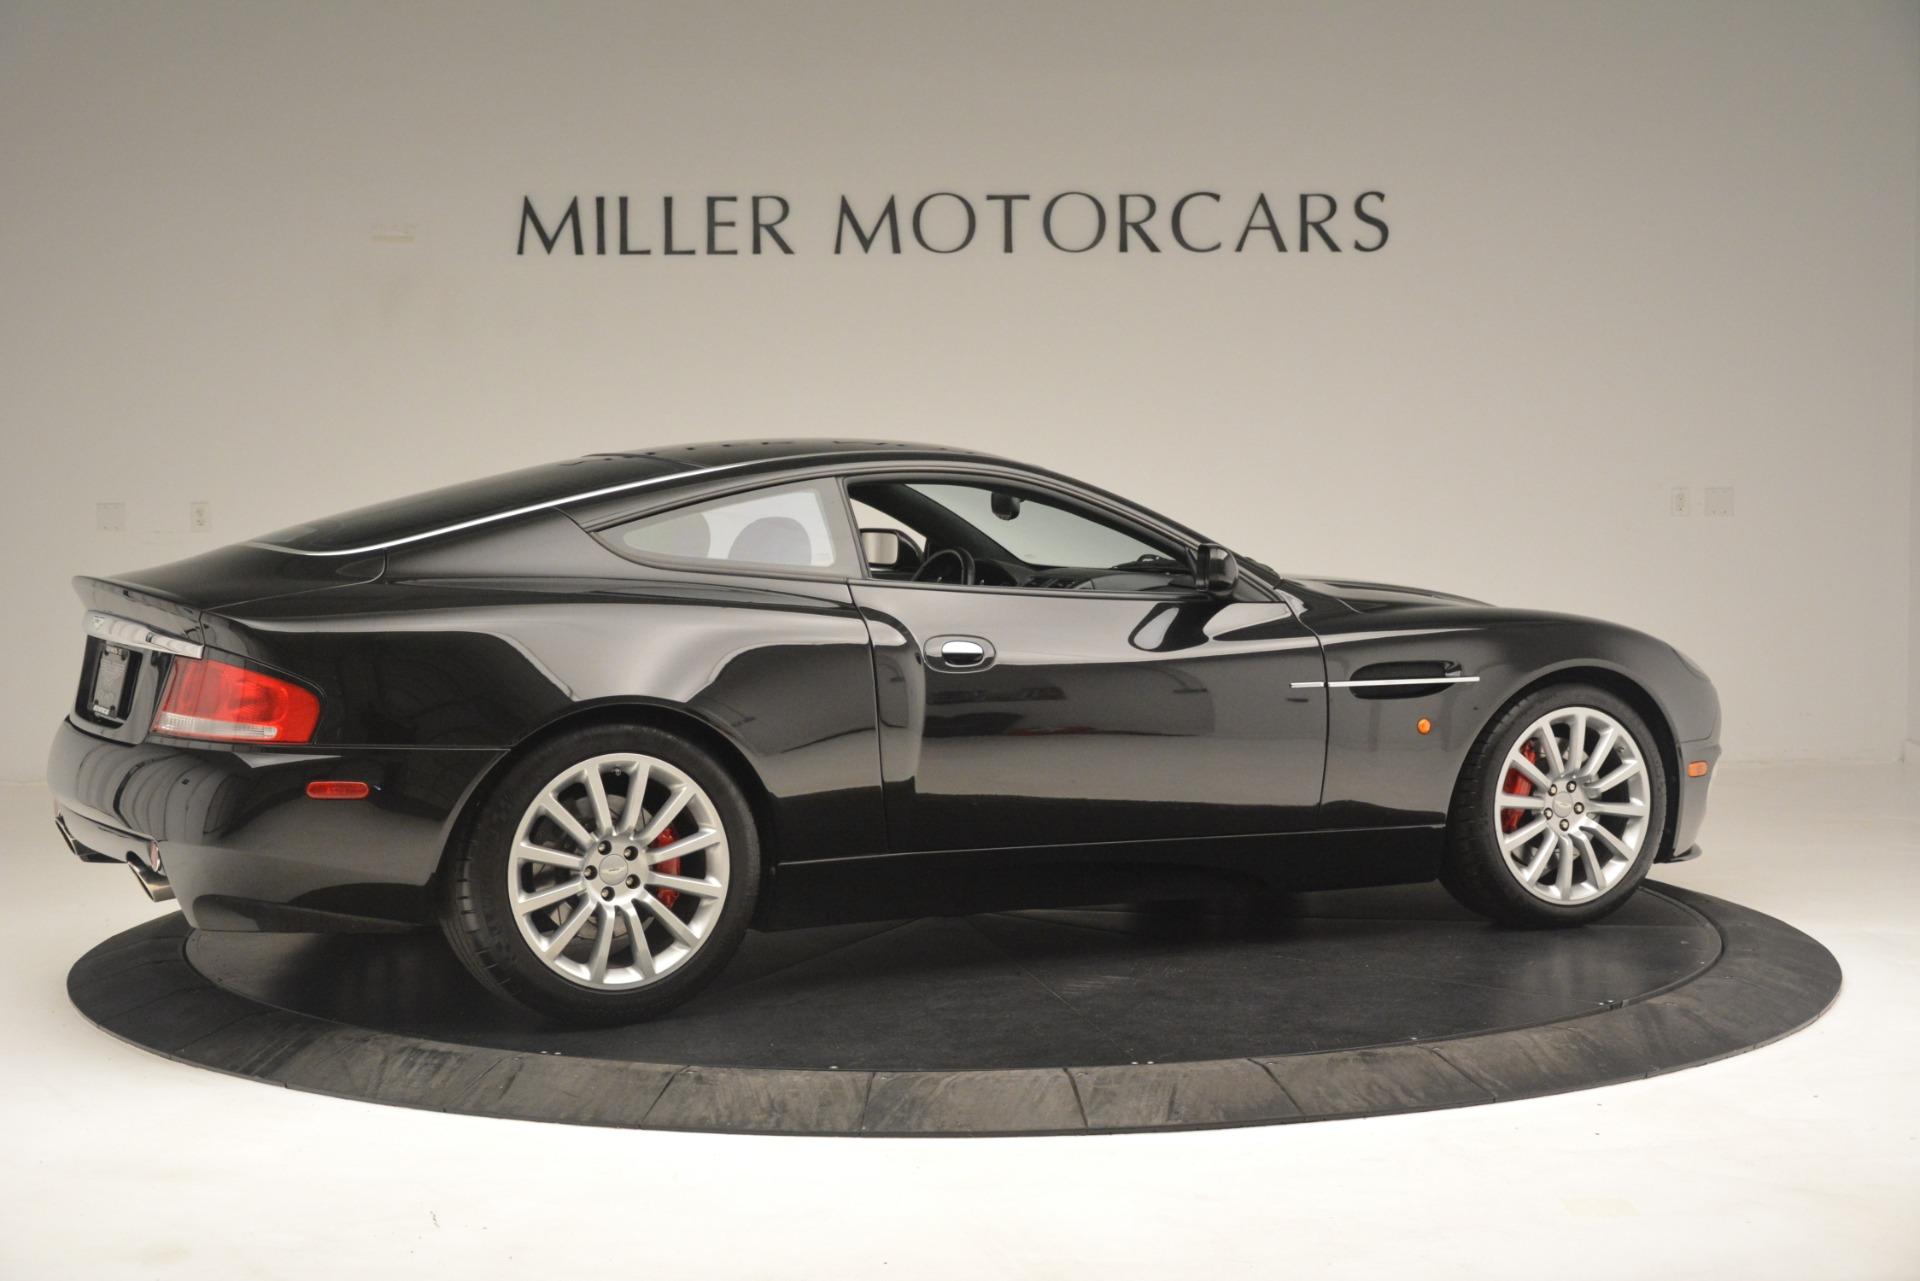 Used 2004 Aston Martin V12 Vanquish